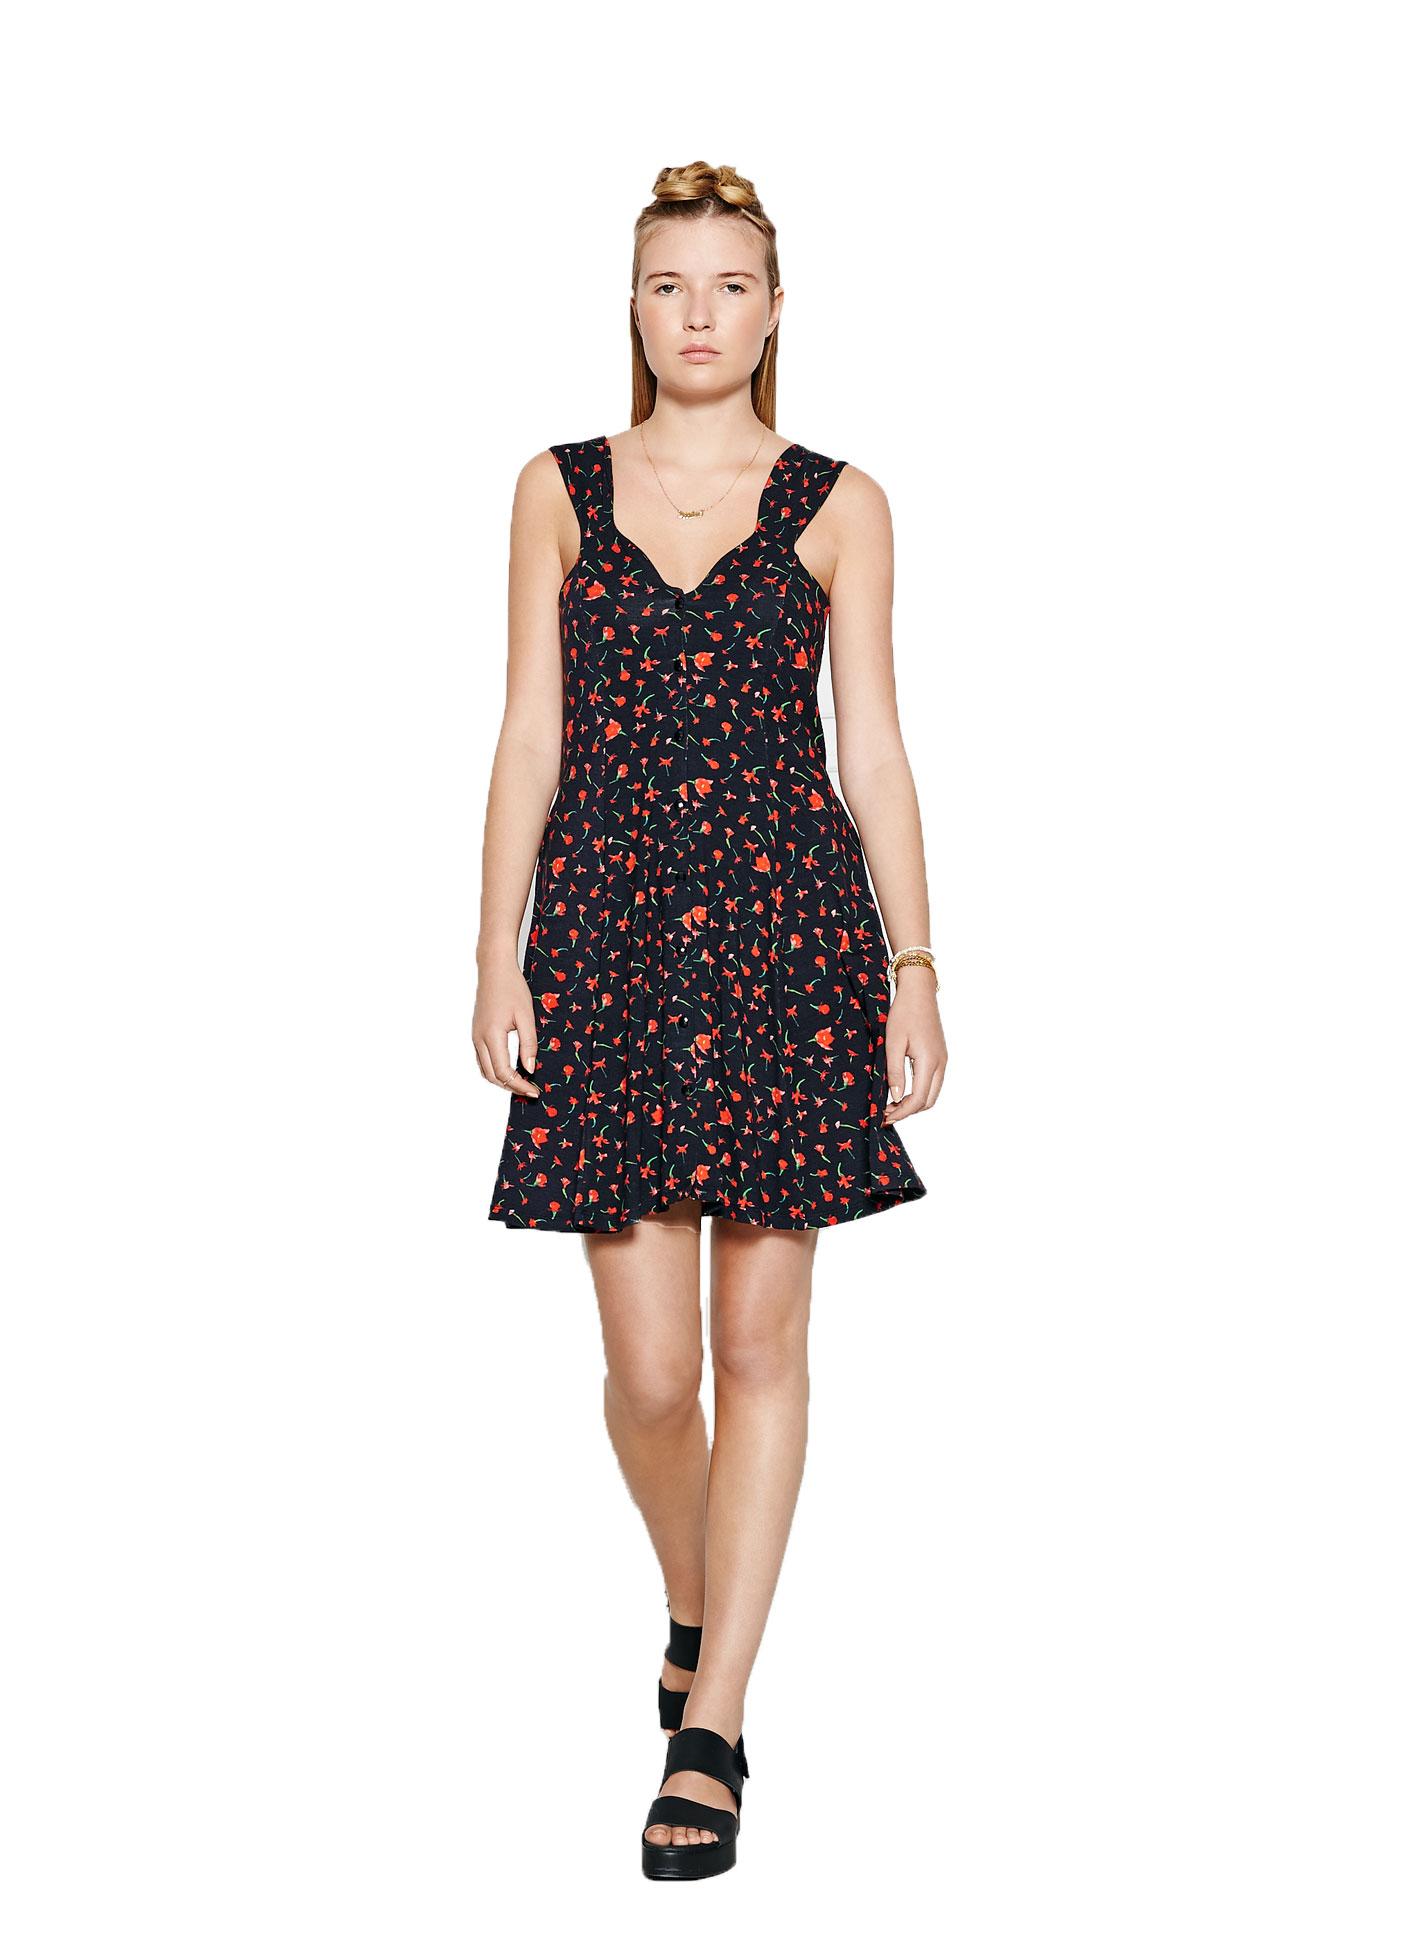 PPQ Cream Label Sweetheart Neckline Dress